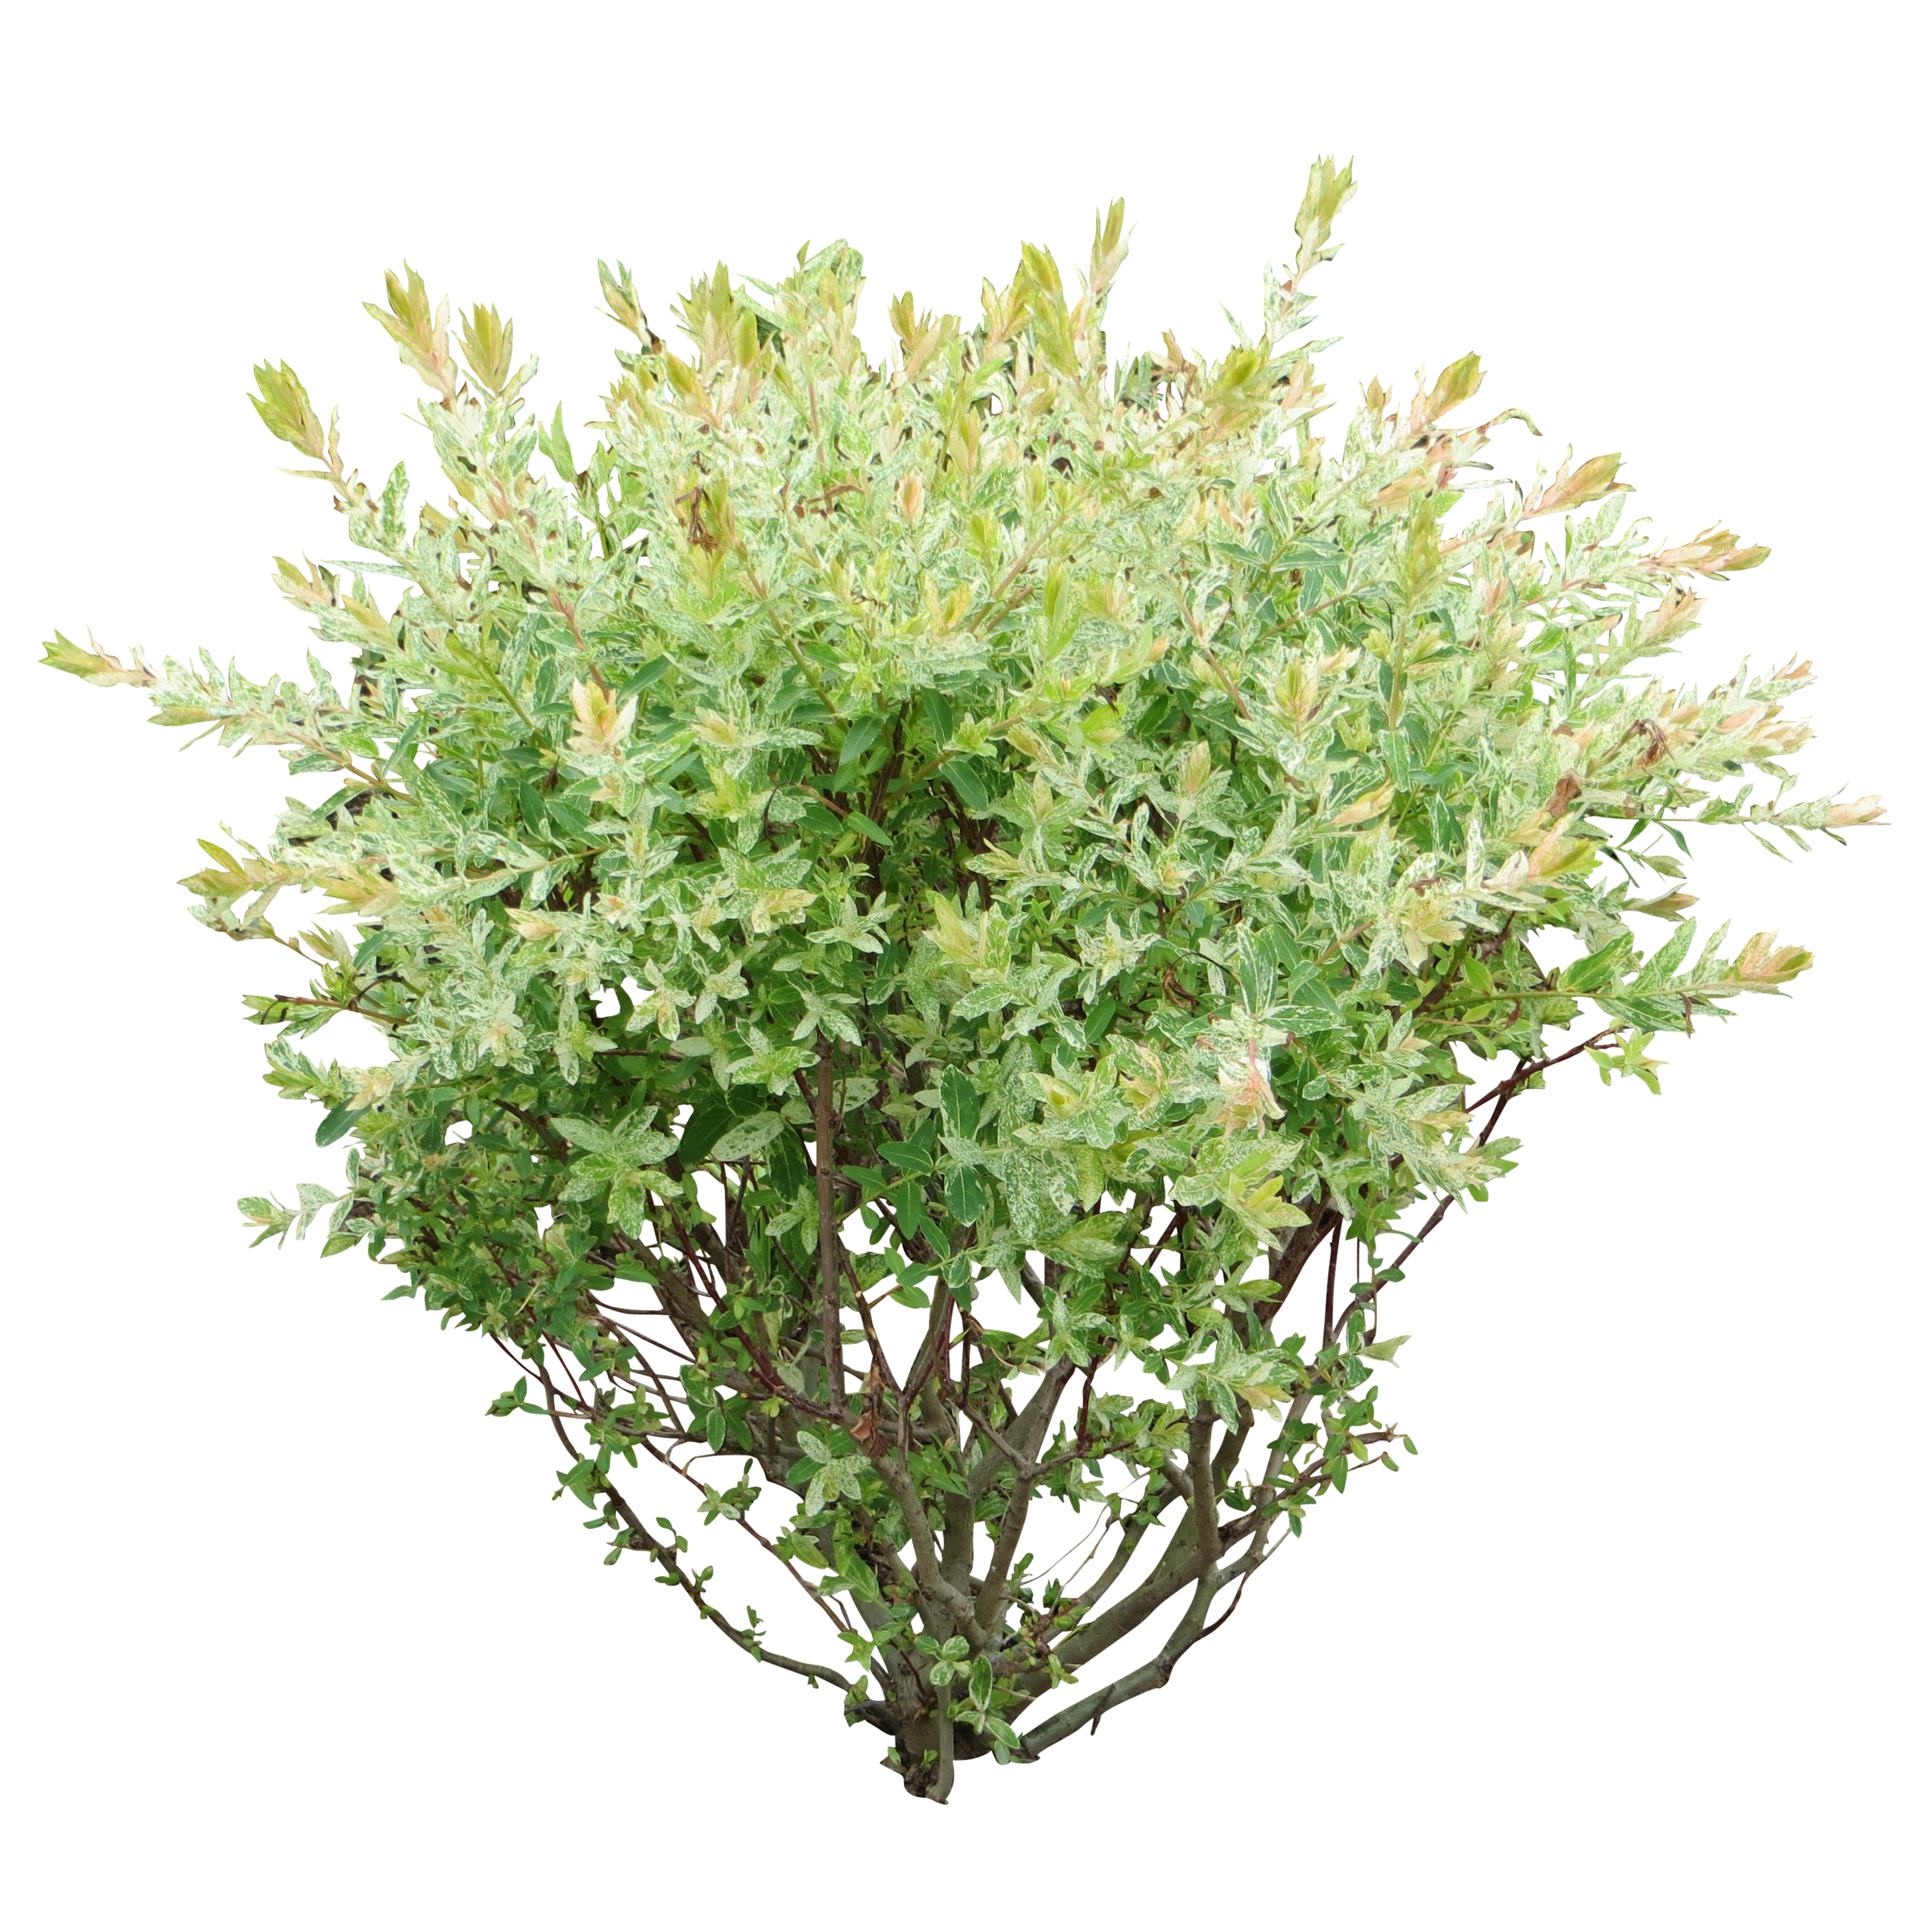 Bush clipart shrubbery. Png image